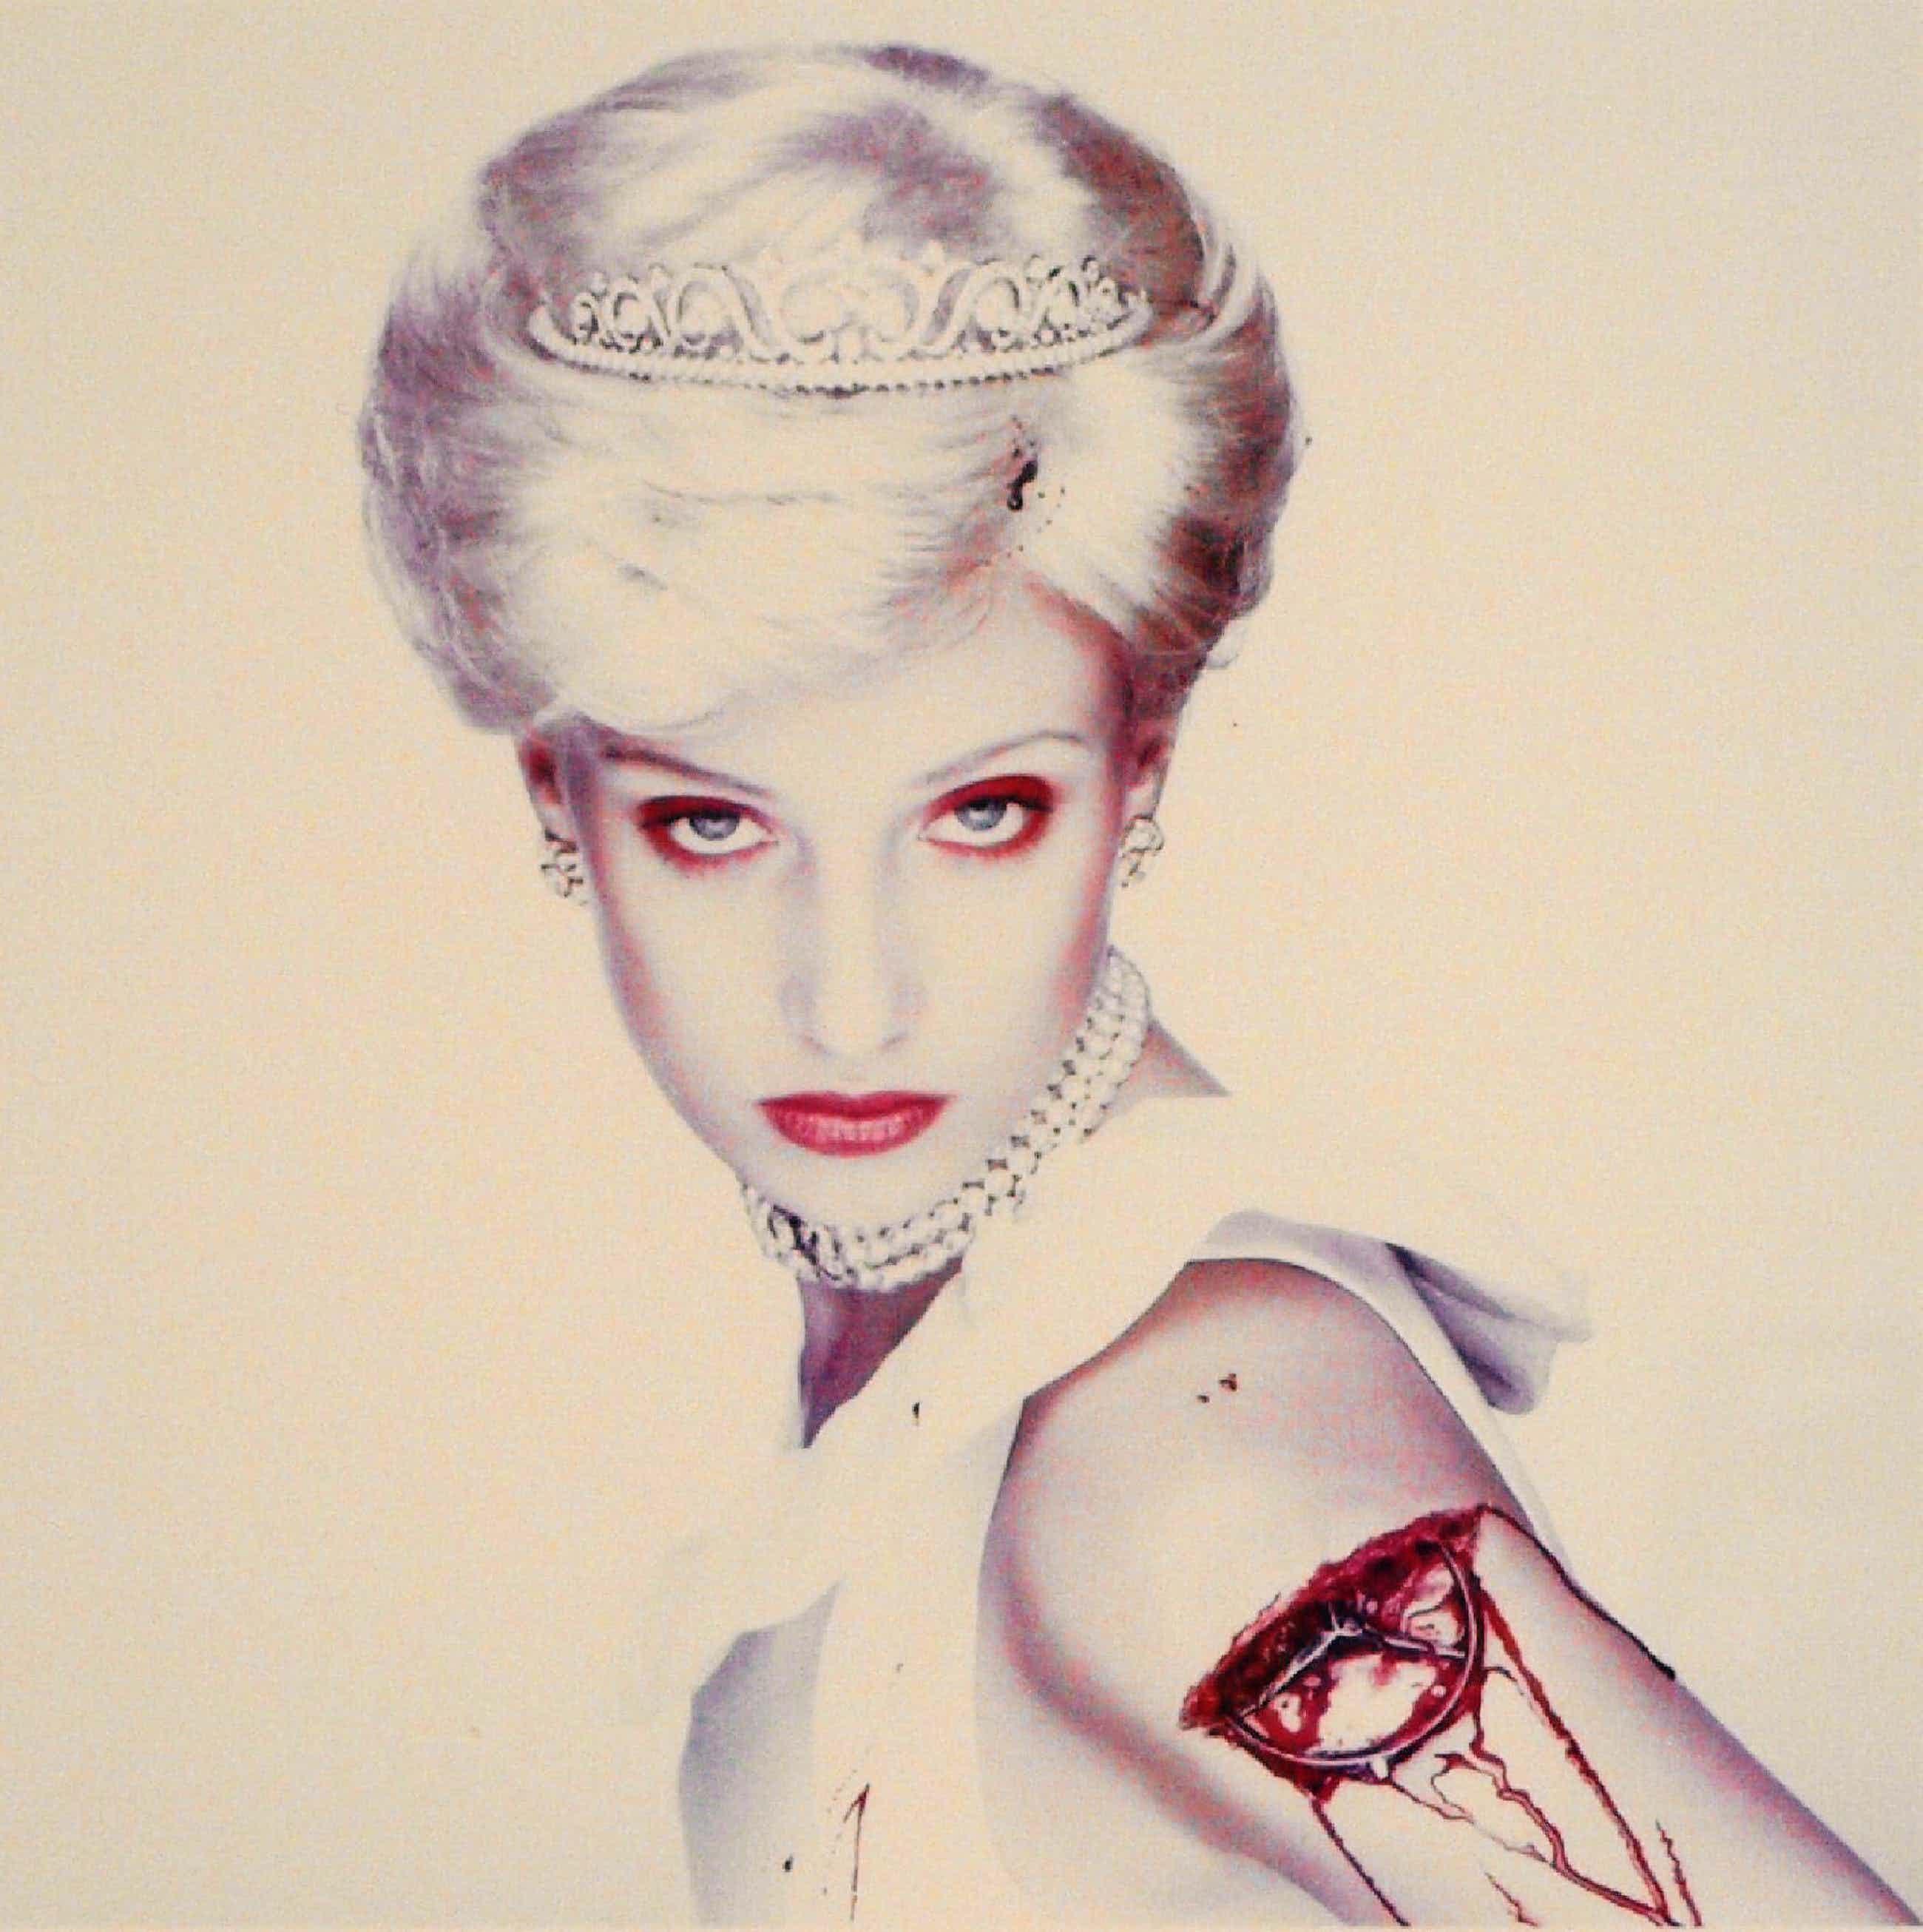 Erwin Olaf - Ingelijste foto uit de serie 'Royal Blood' , Lady Diana - 2000 kopen? Bied vanaf 3500!